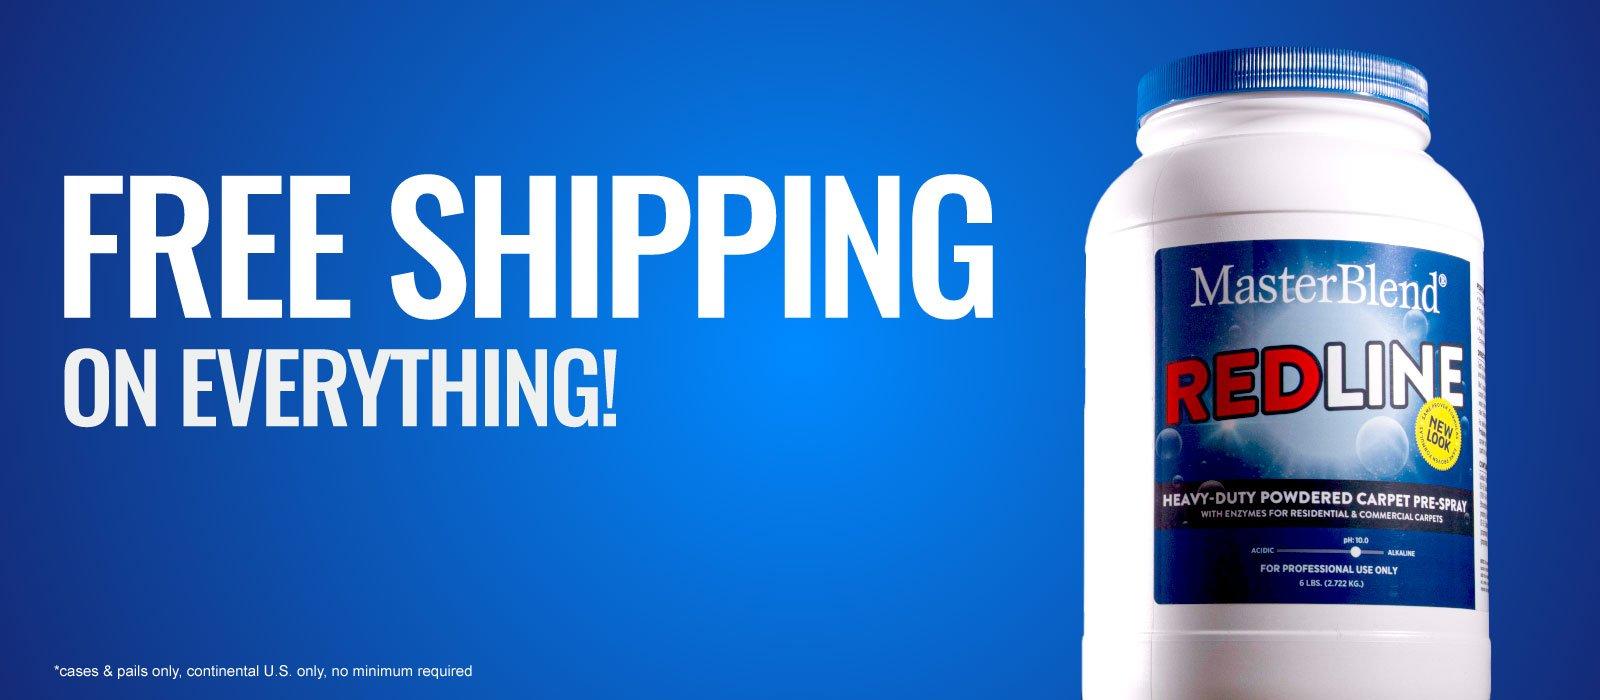 free-shipping-hero-banner-fixed.jpg